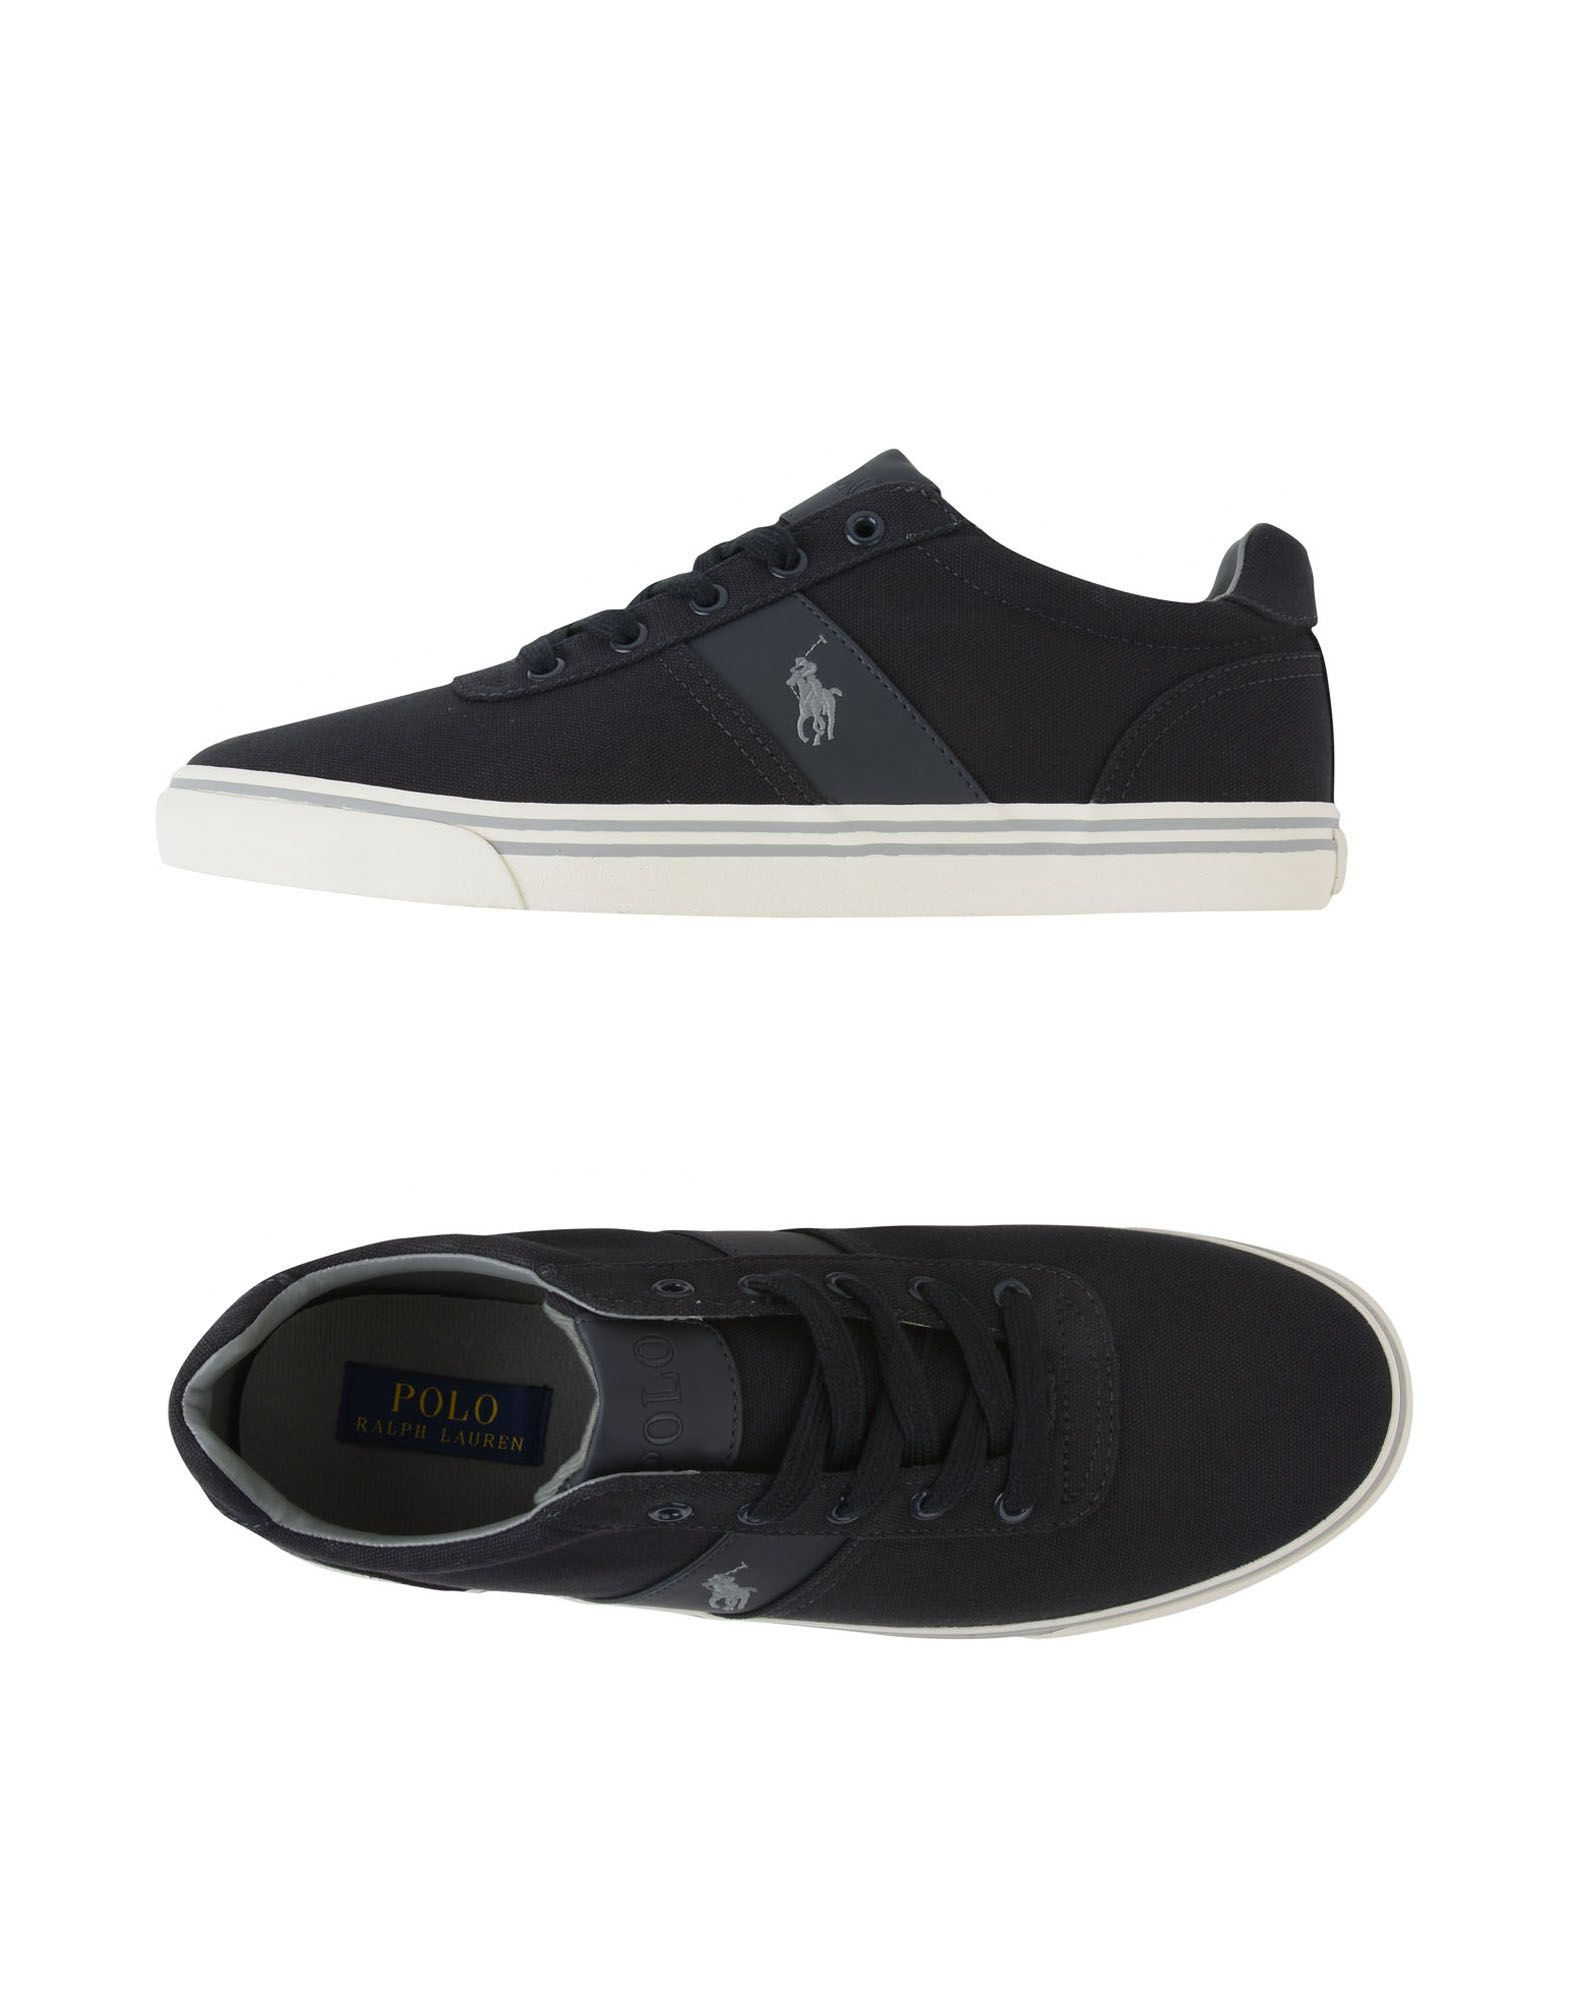 Polo Ralph Lauren Hanford/Ne 11417352FC Heiße Schuhe